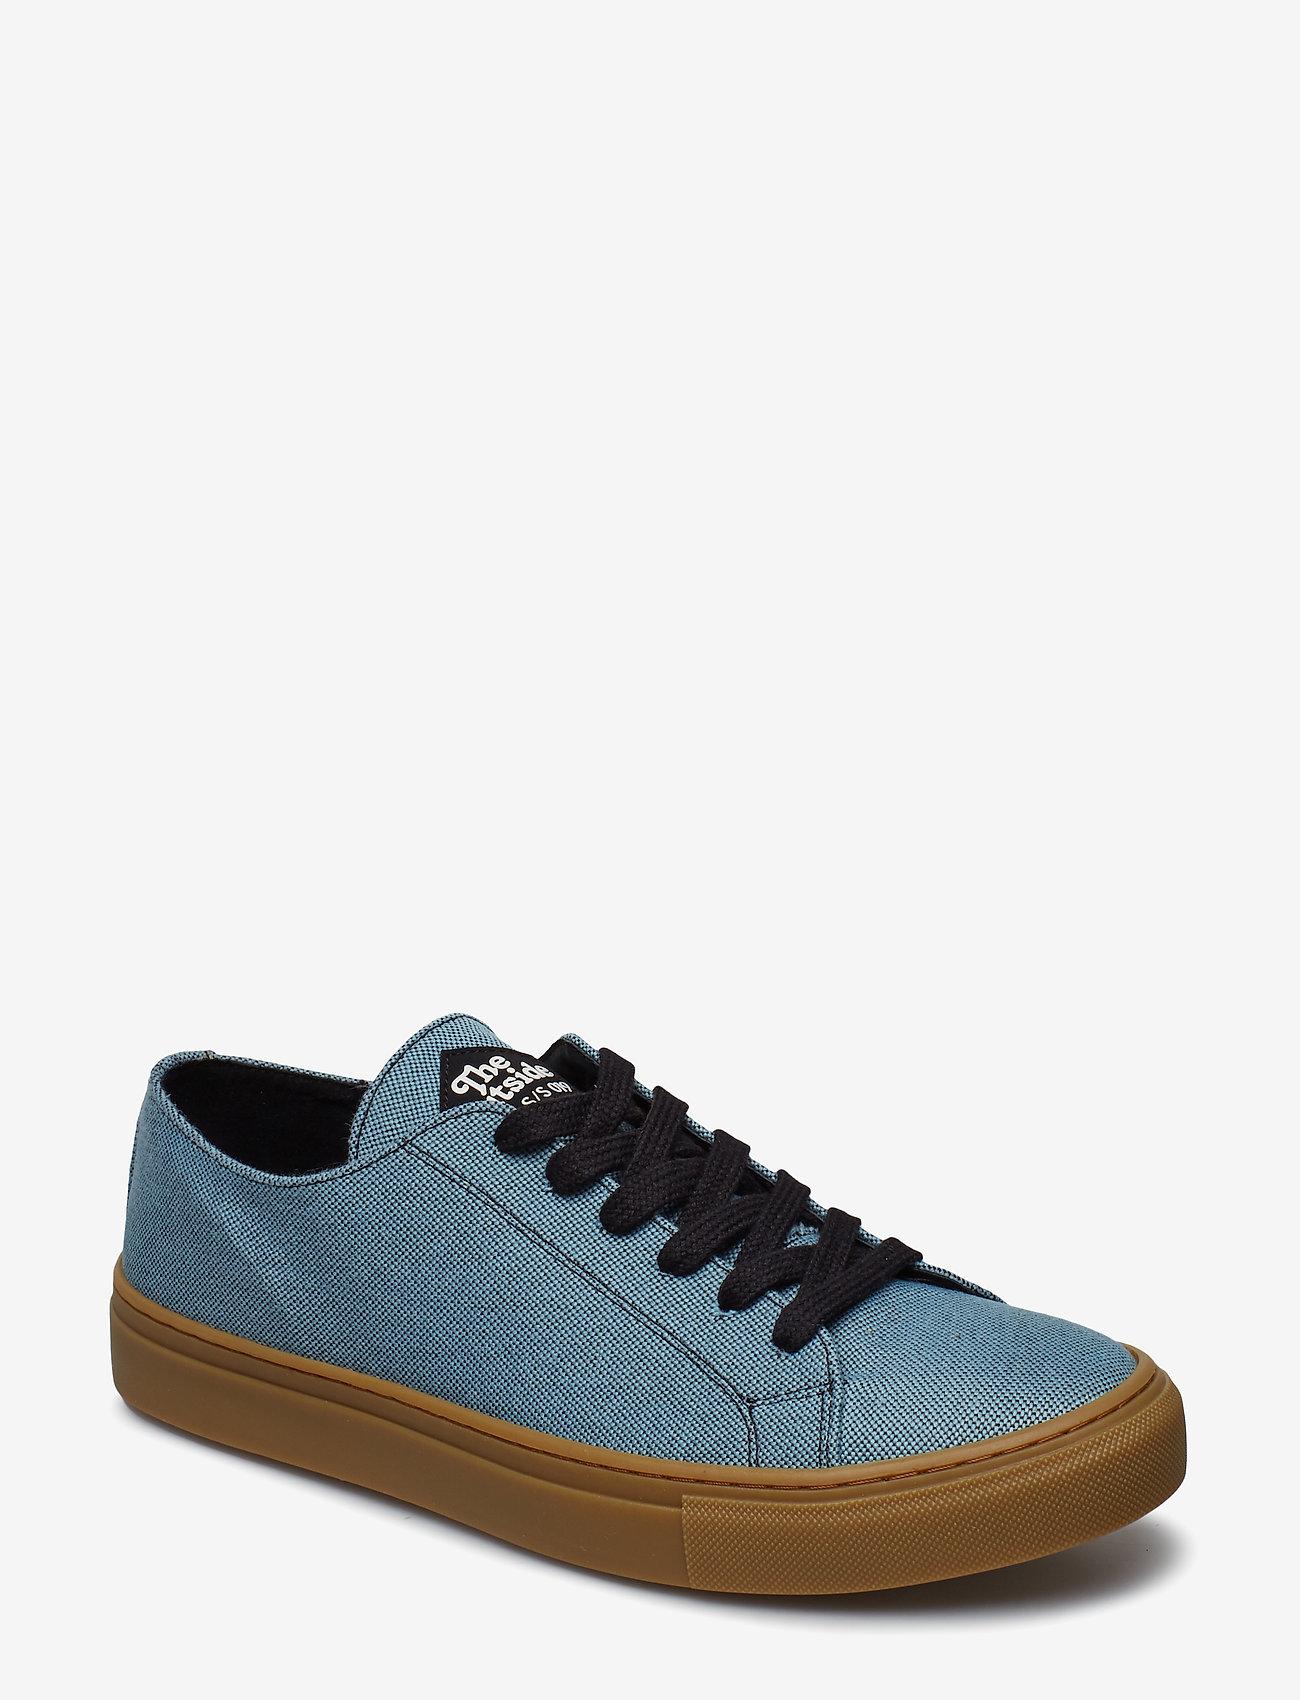 Wood Wood - Alex shoe - låga sneakers - blue - 1